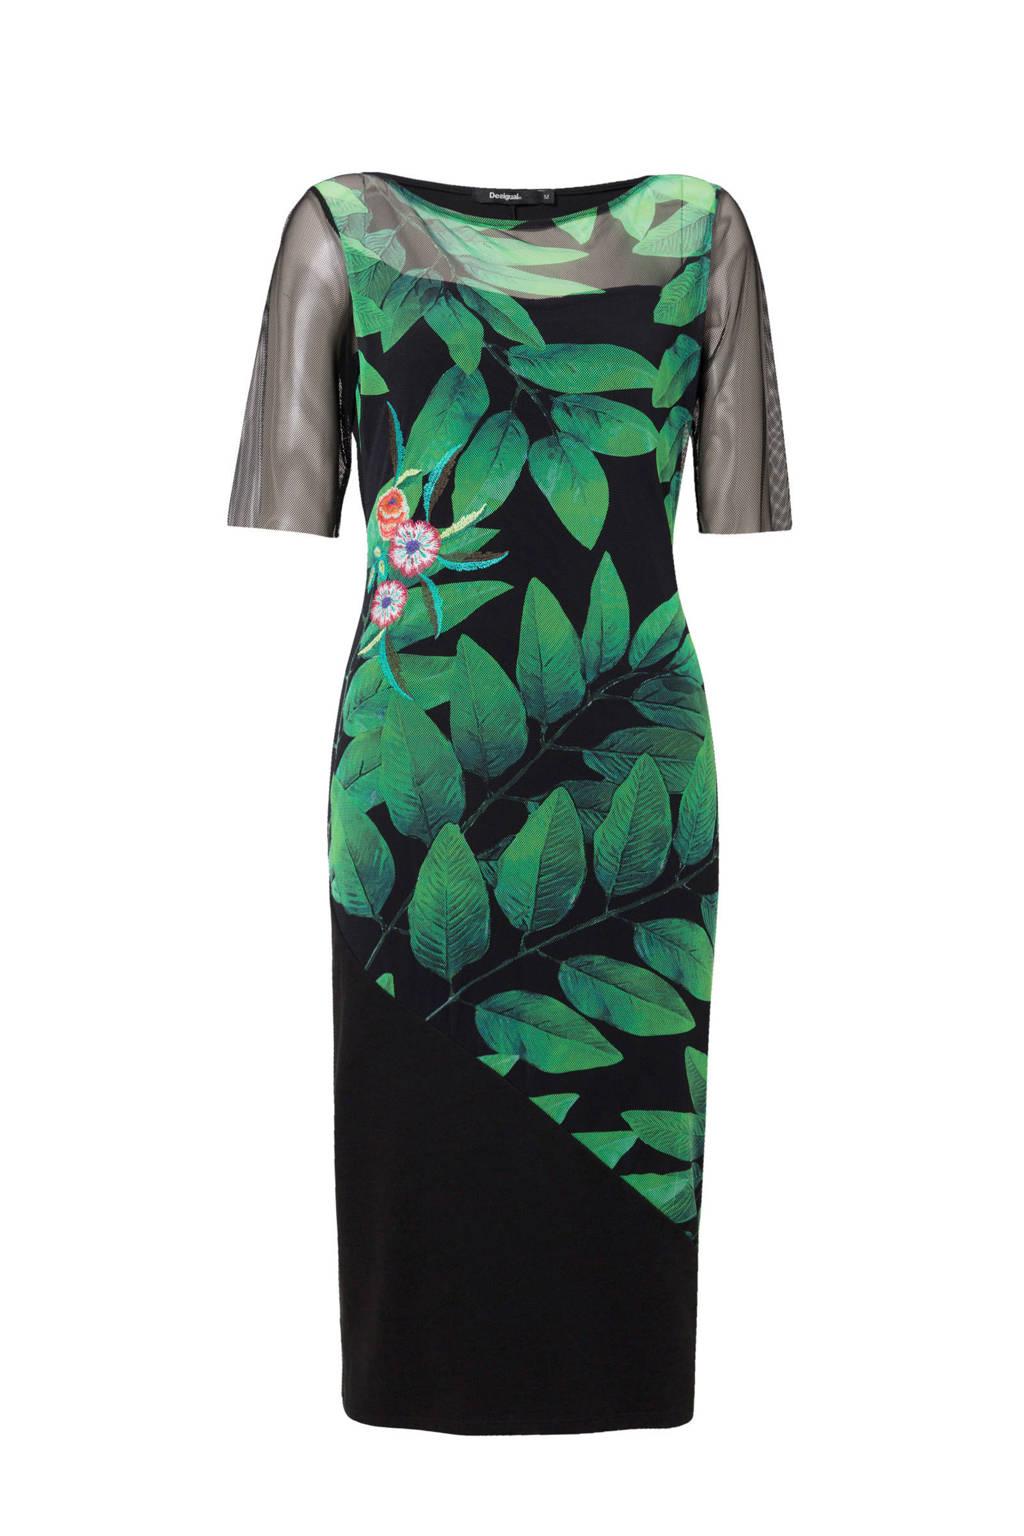 Desigual jurk met bladprint en semi-transparant detail, Zwart/groen